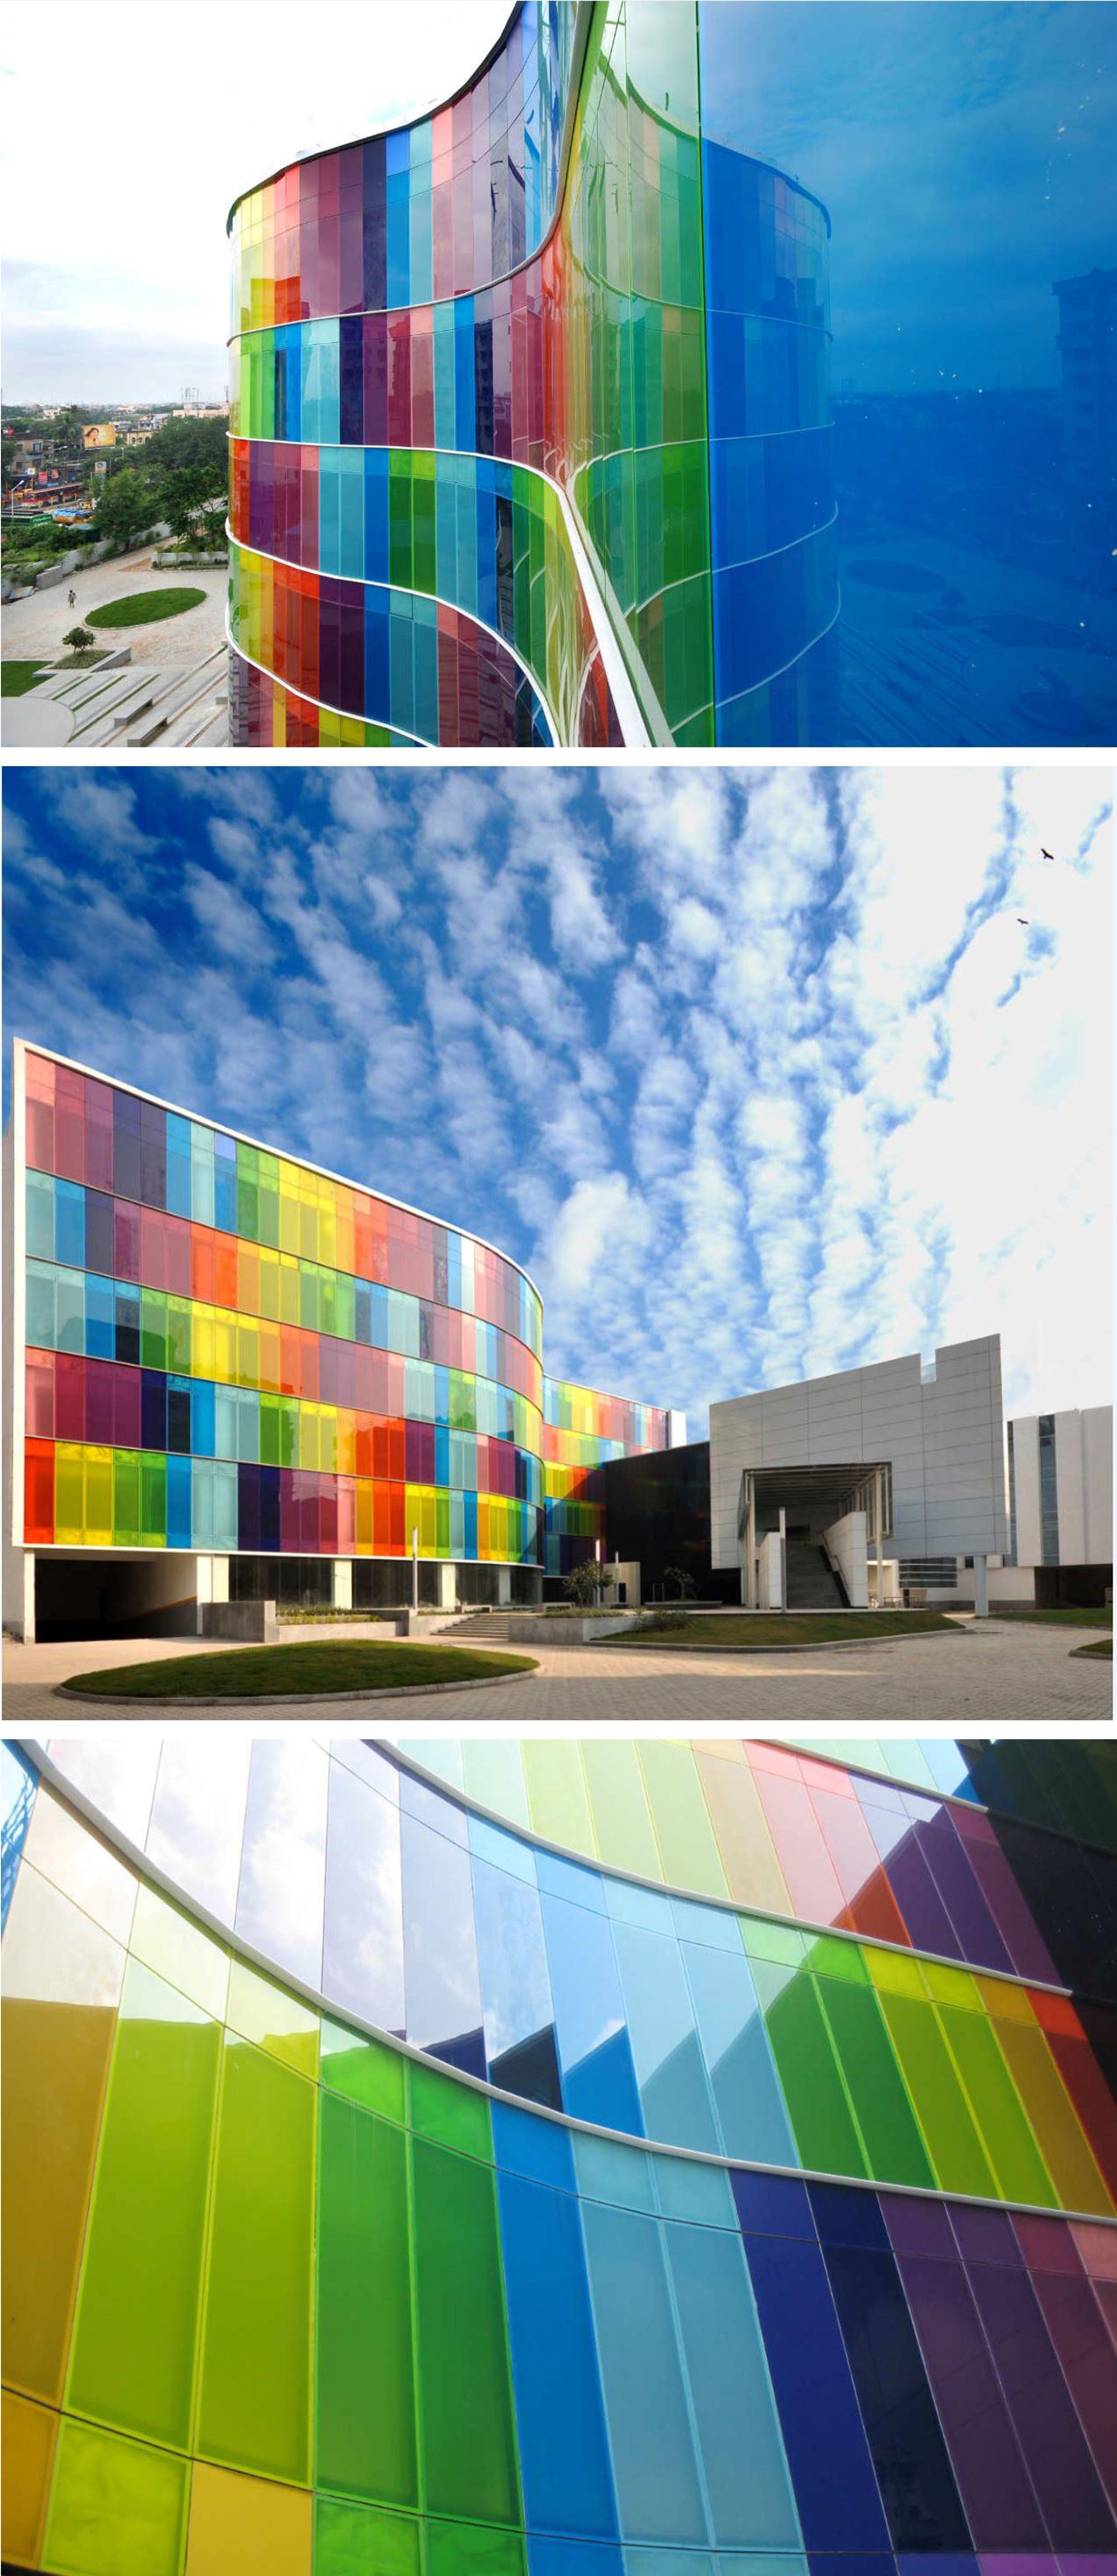 15+ Commercial Building Elevation Design | Pinterest | Building ...